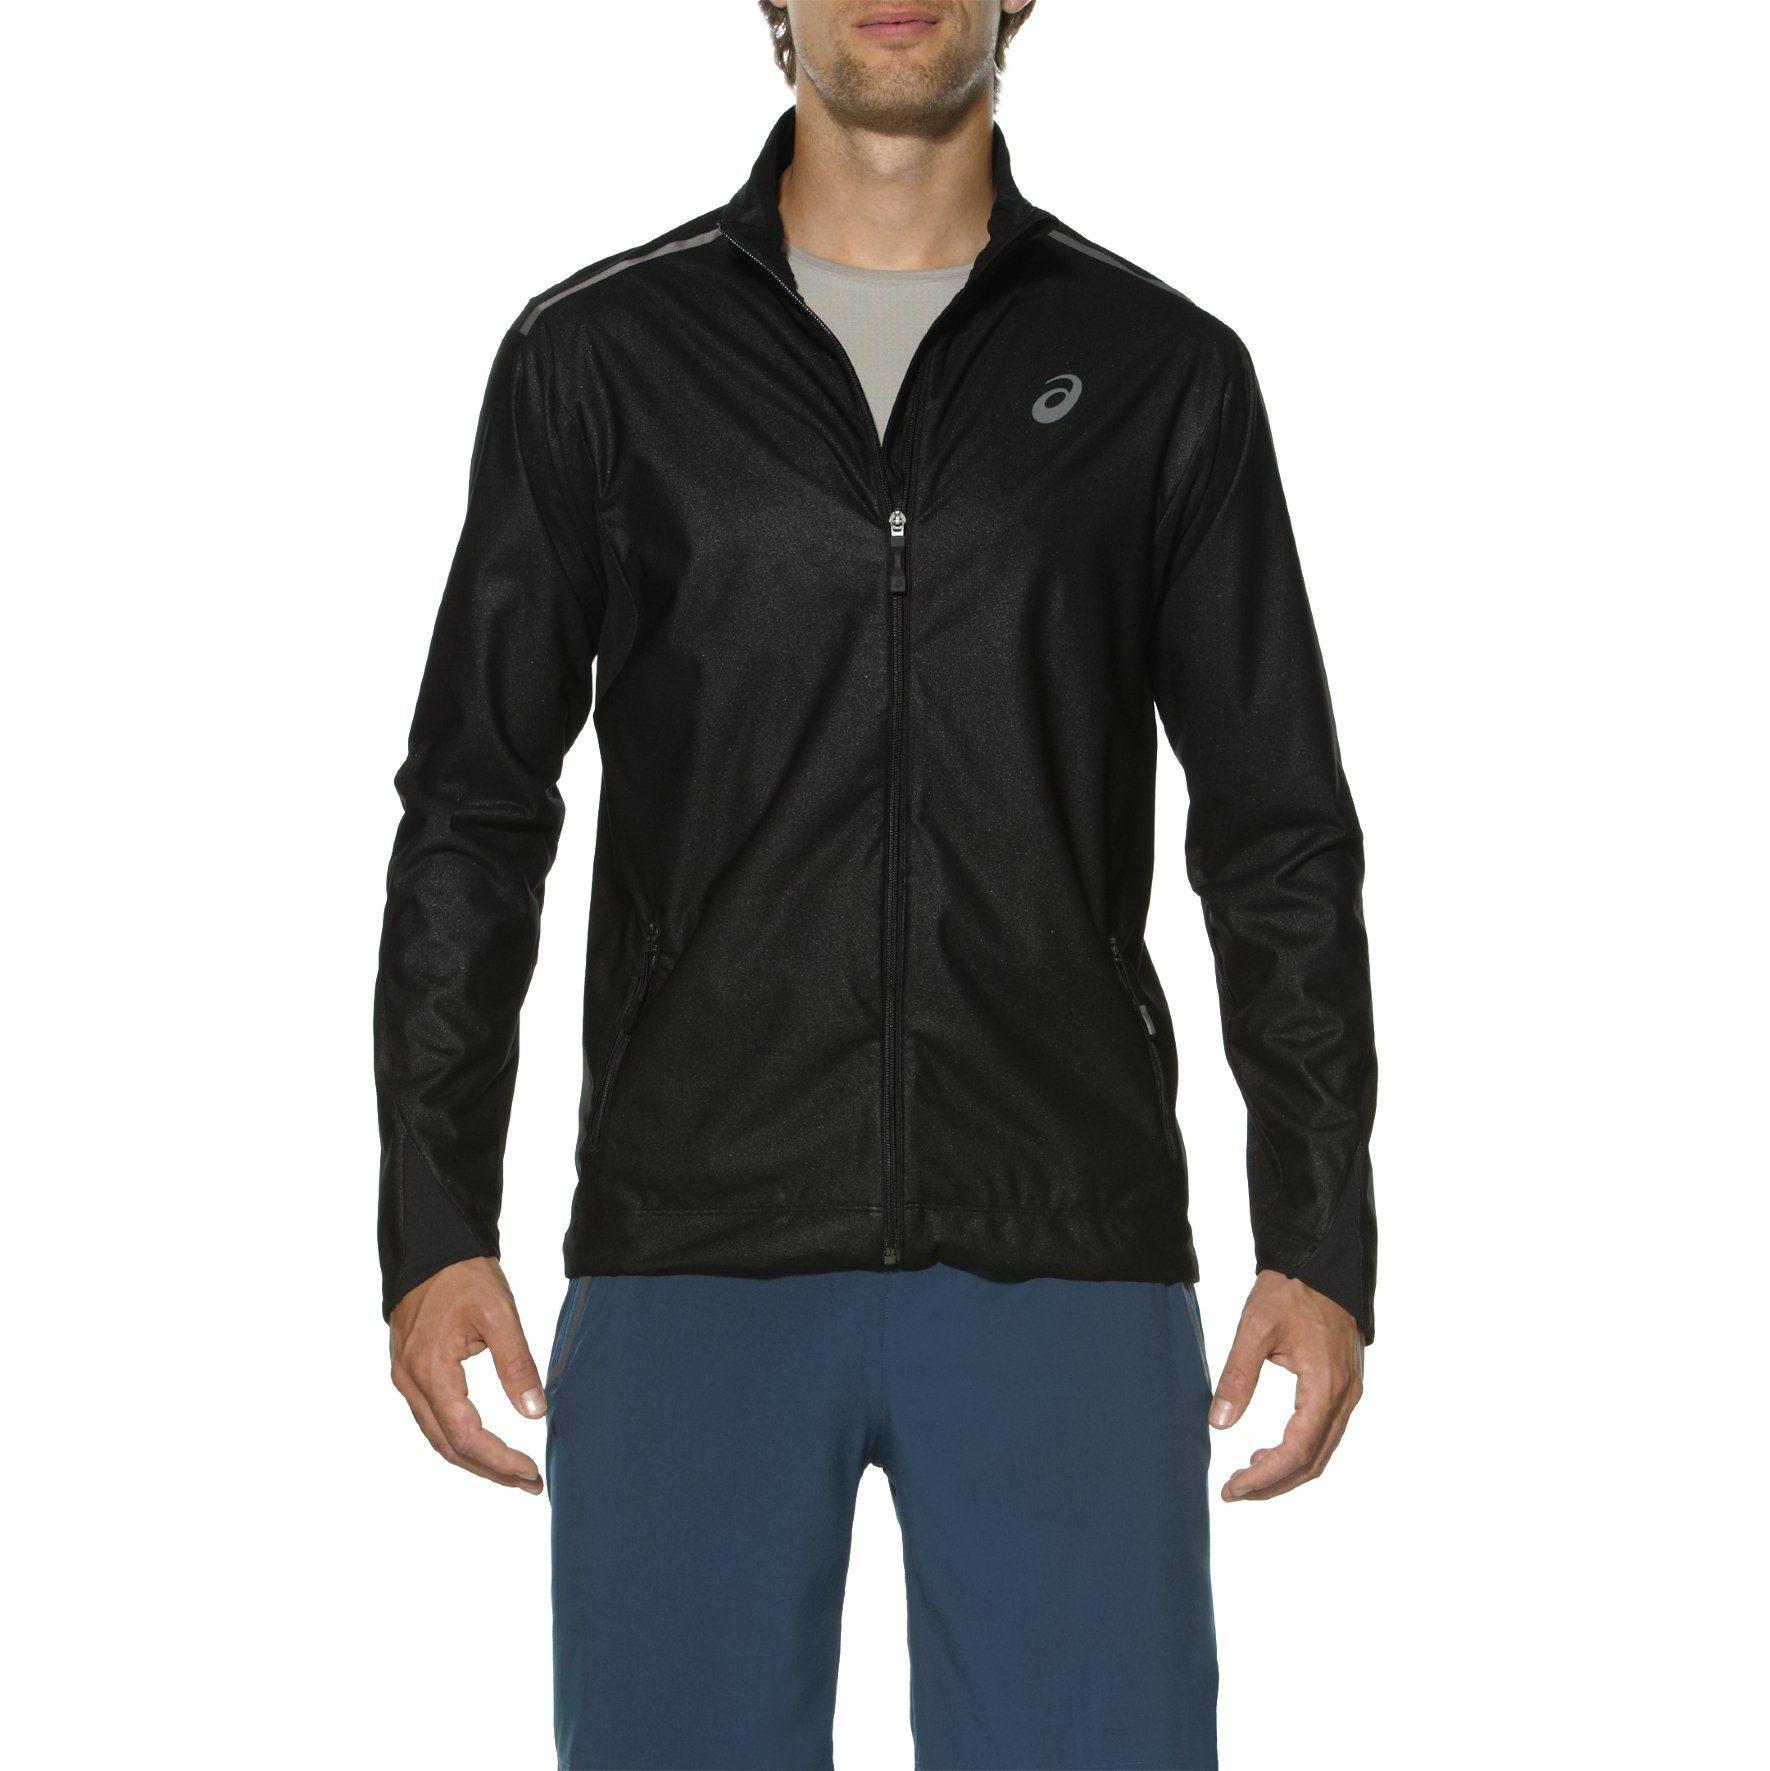 Asics Trainingsjacke »Windblock Jacket Men«